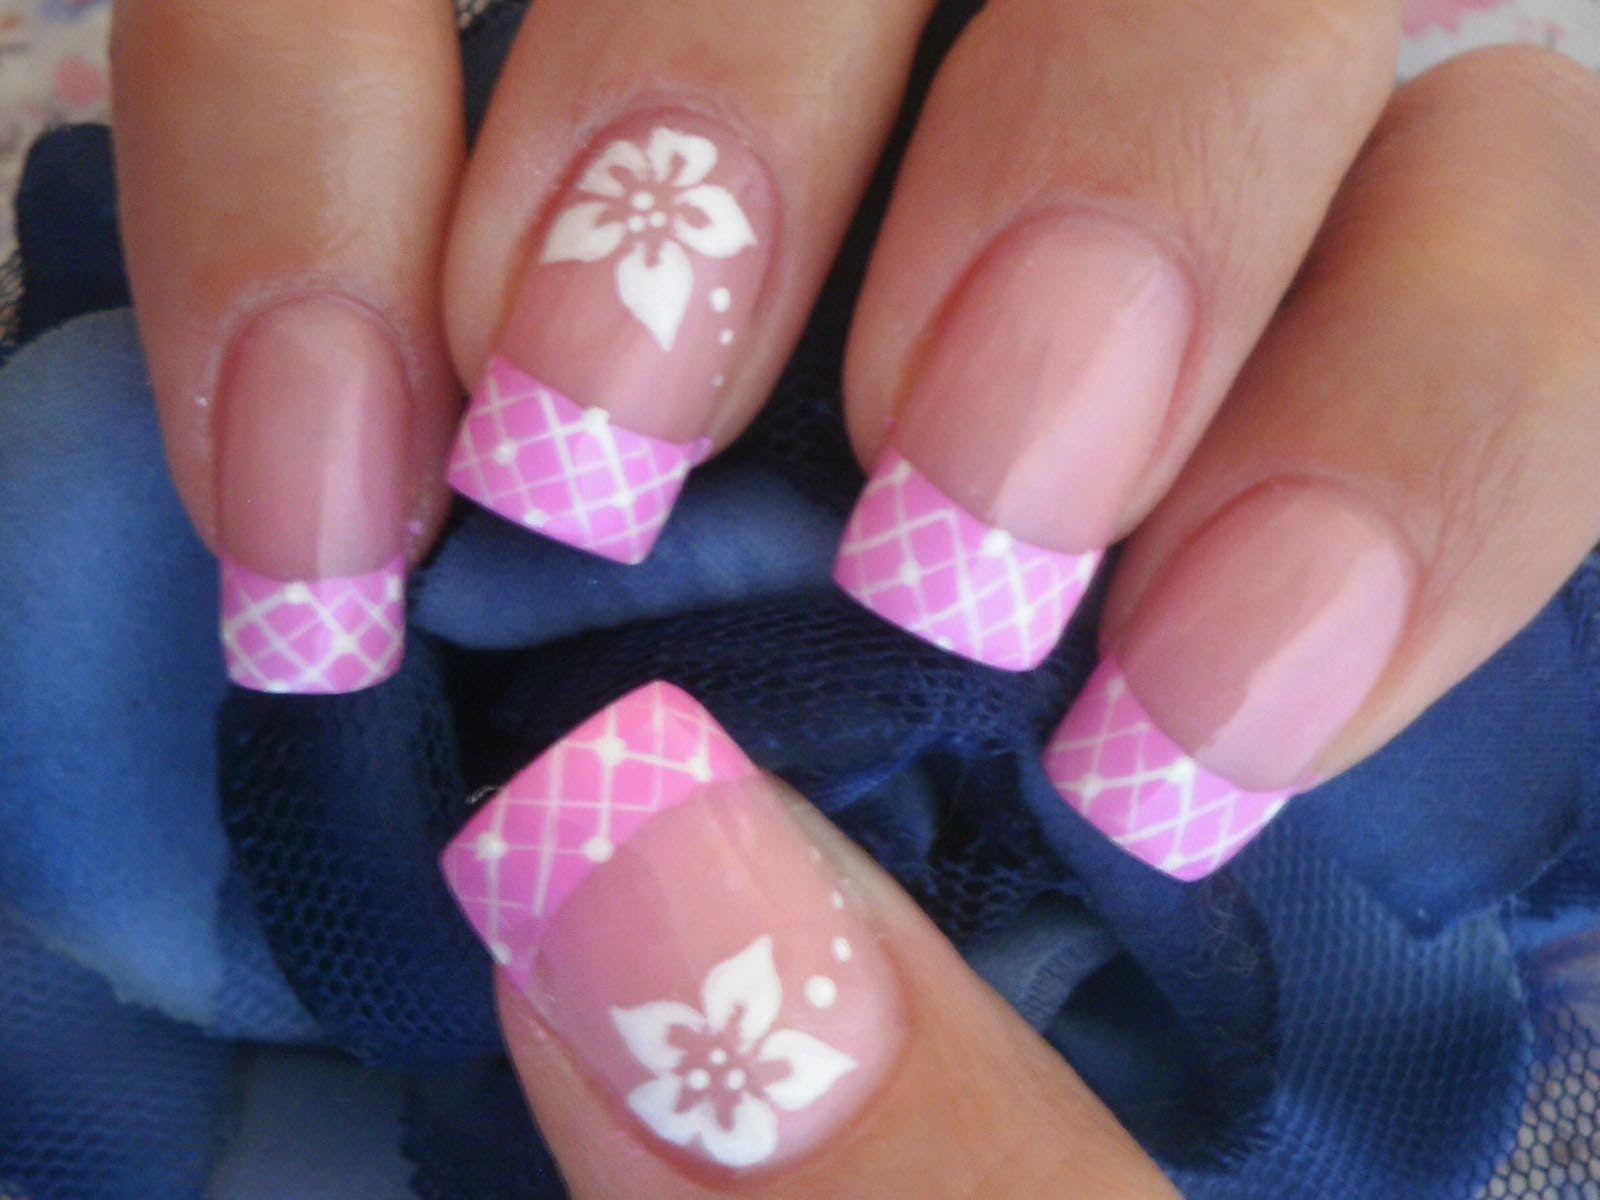 How to paint simple cute floral sencilla flower nail art mani step